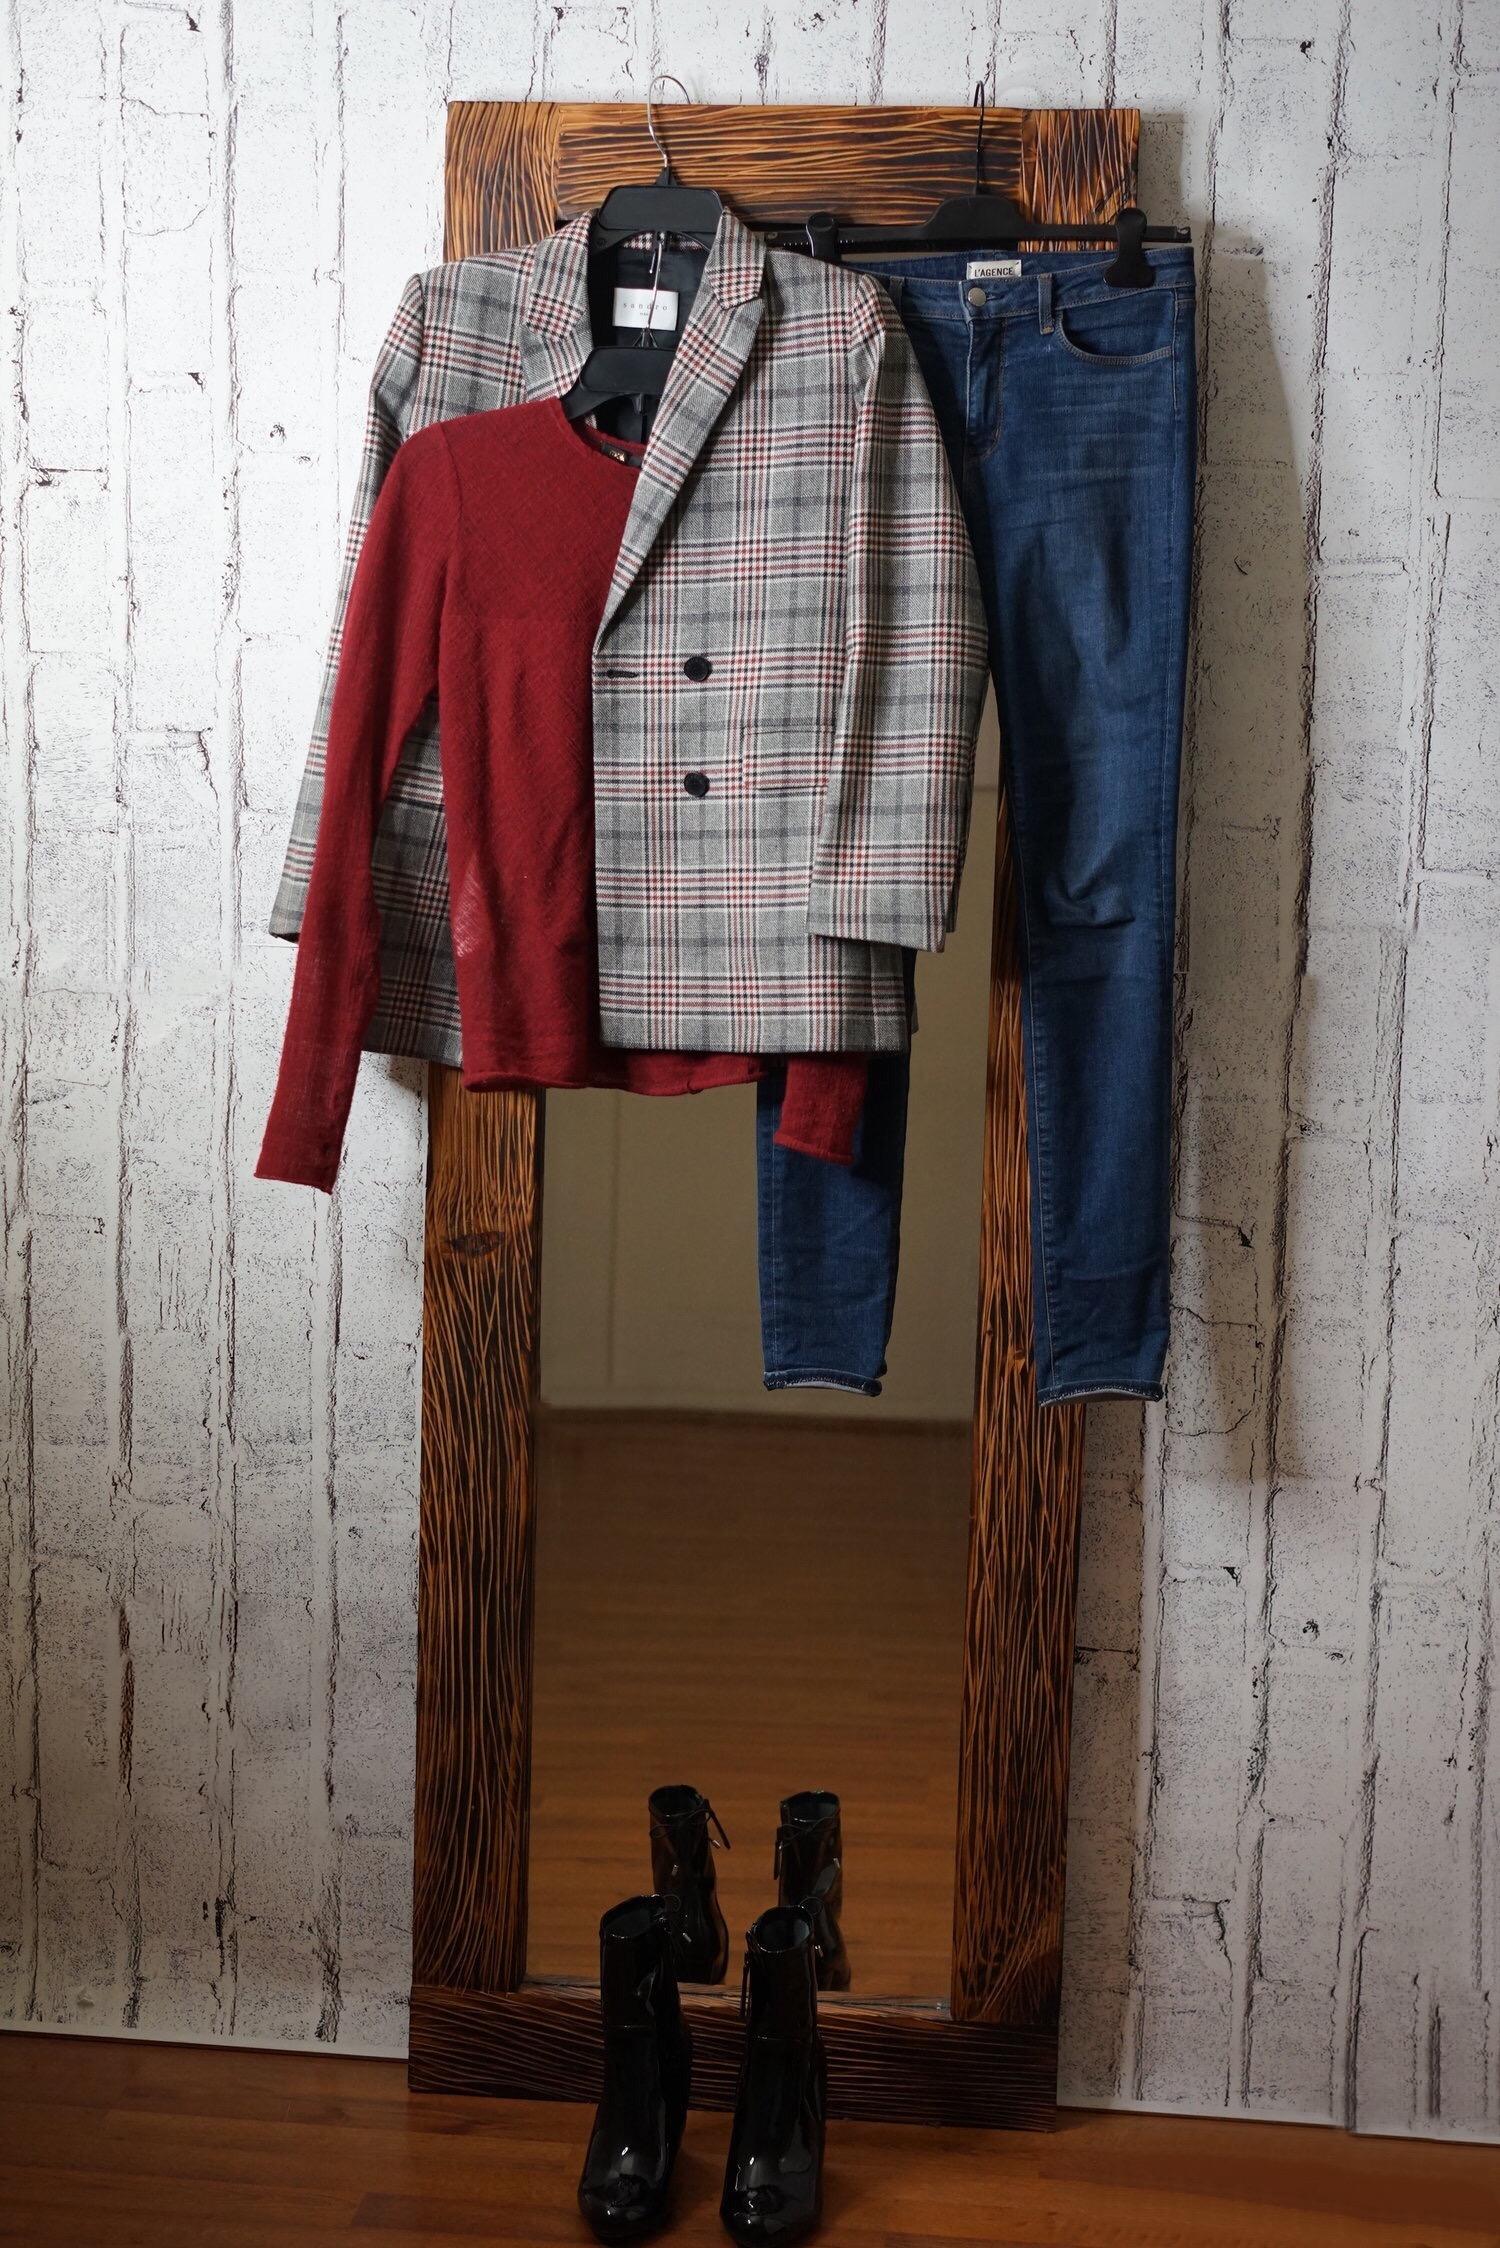 christine_the_style_affaire_sandro_paris_plaid_jacket_blazers_maje_burgundy_top_material_girl_boots_aldo_l_agence_jeans_blue_outfit_hm_earrings_fenty_beauty_lipstick_nyc.jpg